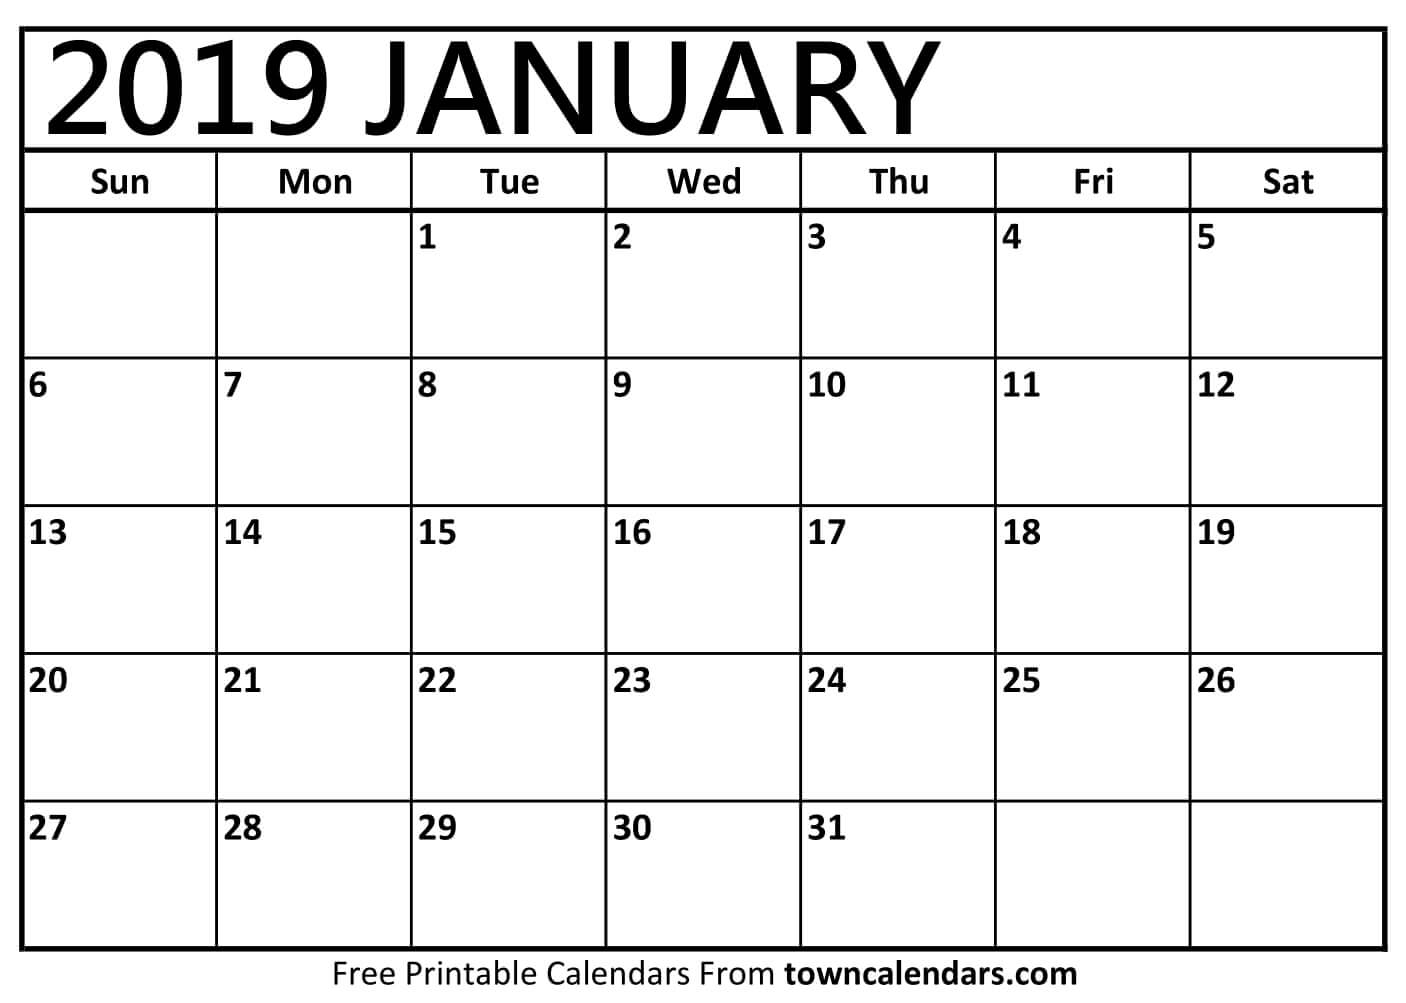 Printable Calendar January 2019 Free - Free Printable